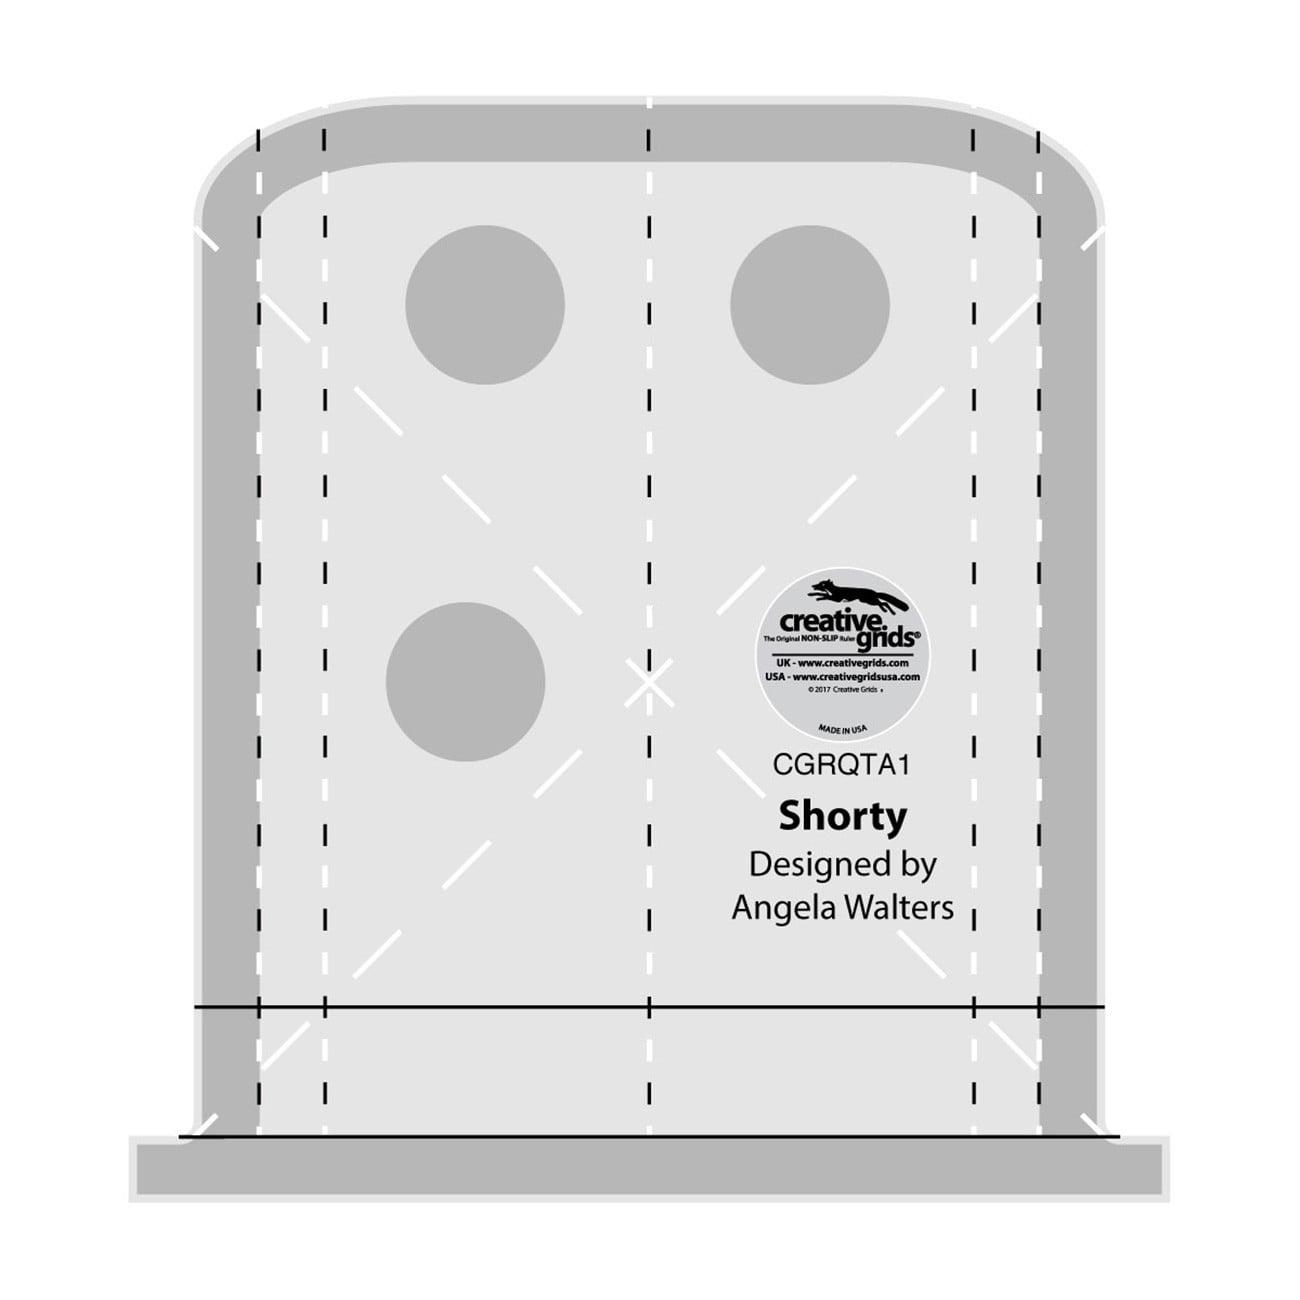 Creative Grids Machine Quilting Tool - Shorty (CGRQTA1)